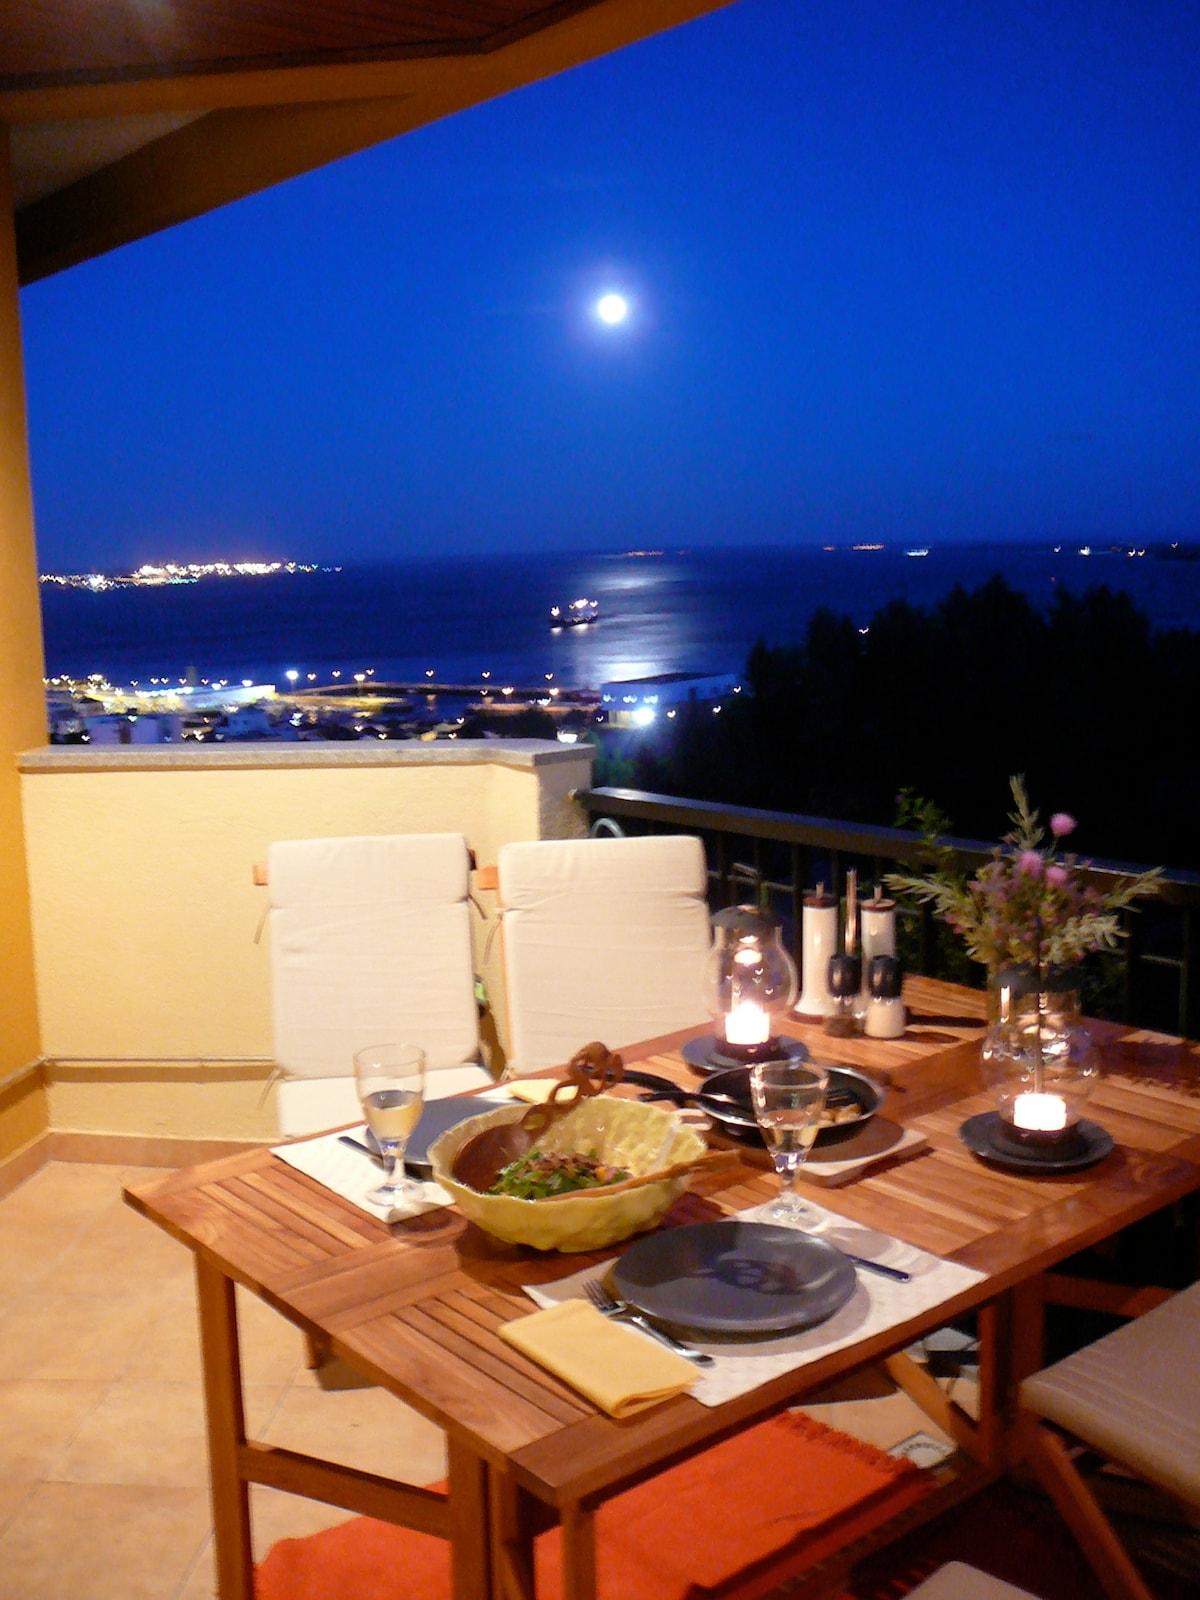 A moonlight dinner on the balcony